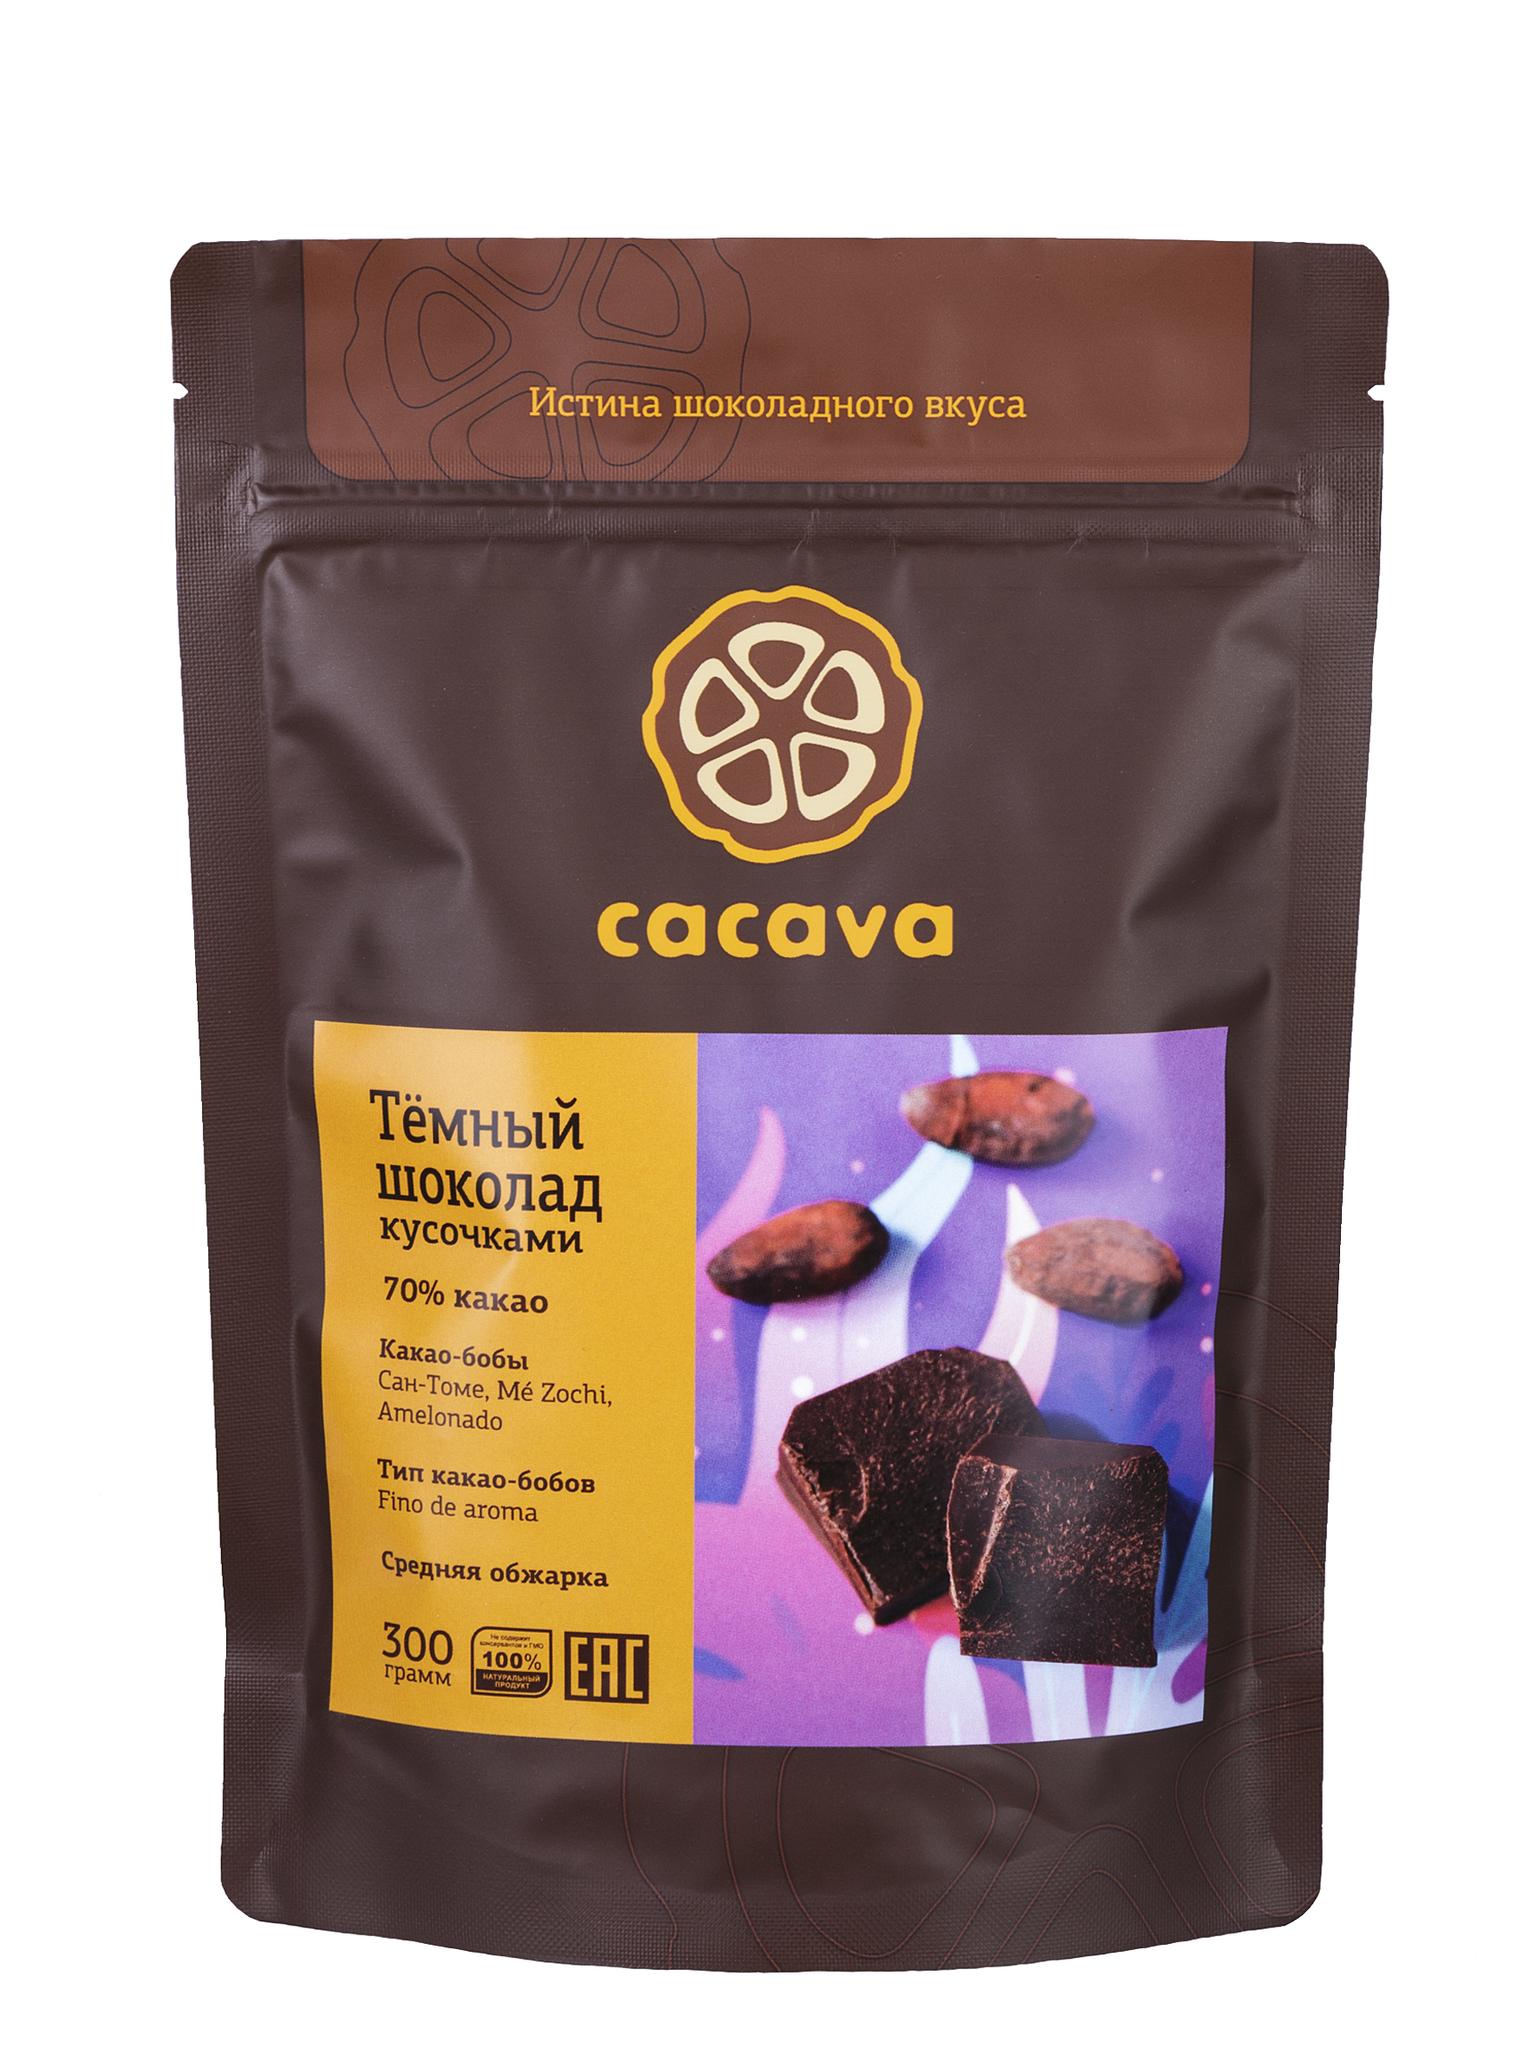 Тёмный шоколад 65 % какао (Сан-Томе), упаковка 300 грамм